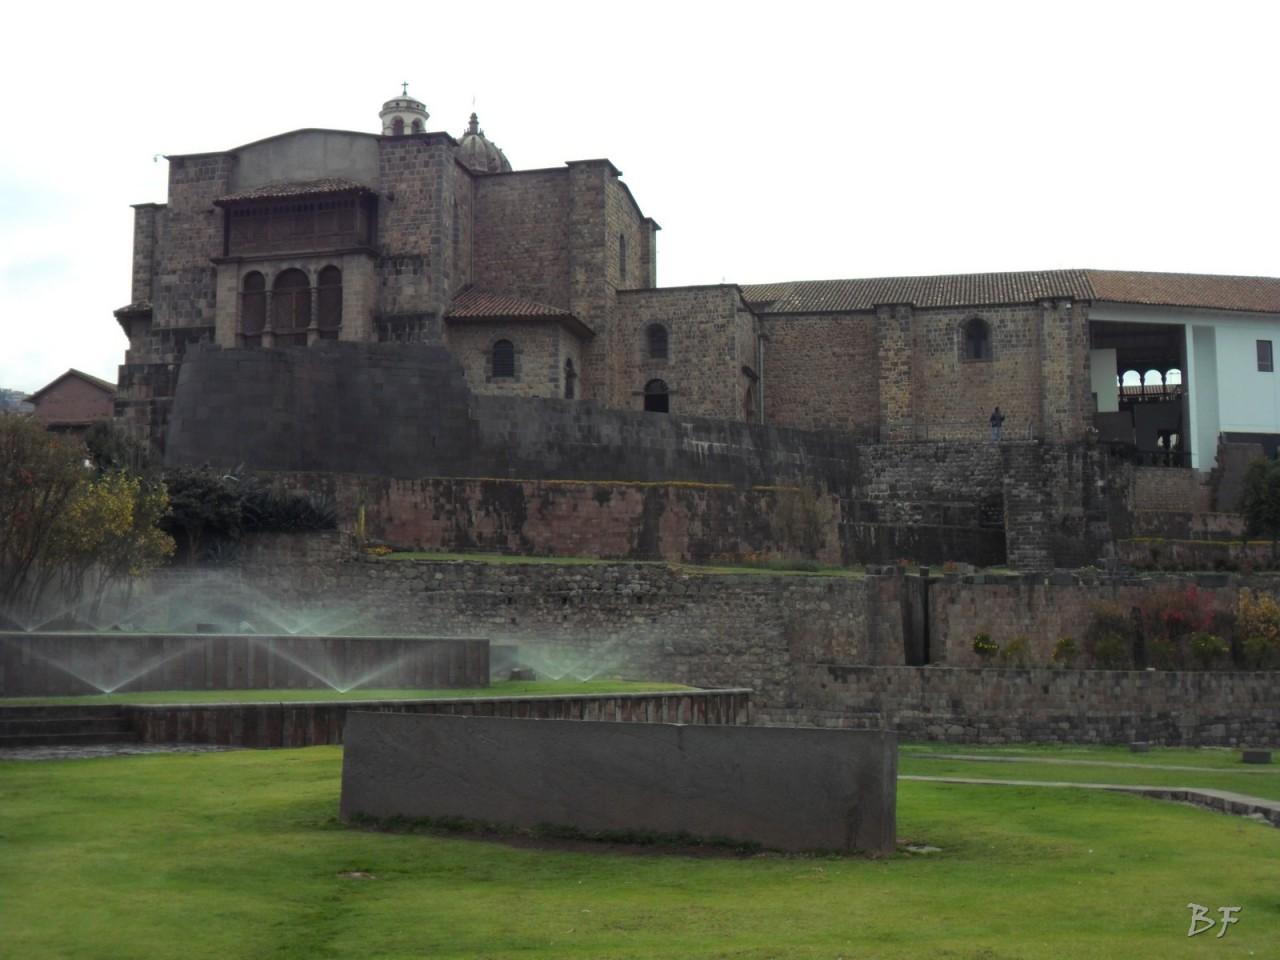 Mura-Poligonali-Megaliti-Tempio-Coricancha-Cusco-Perù-61